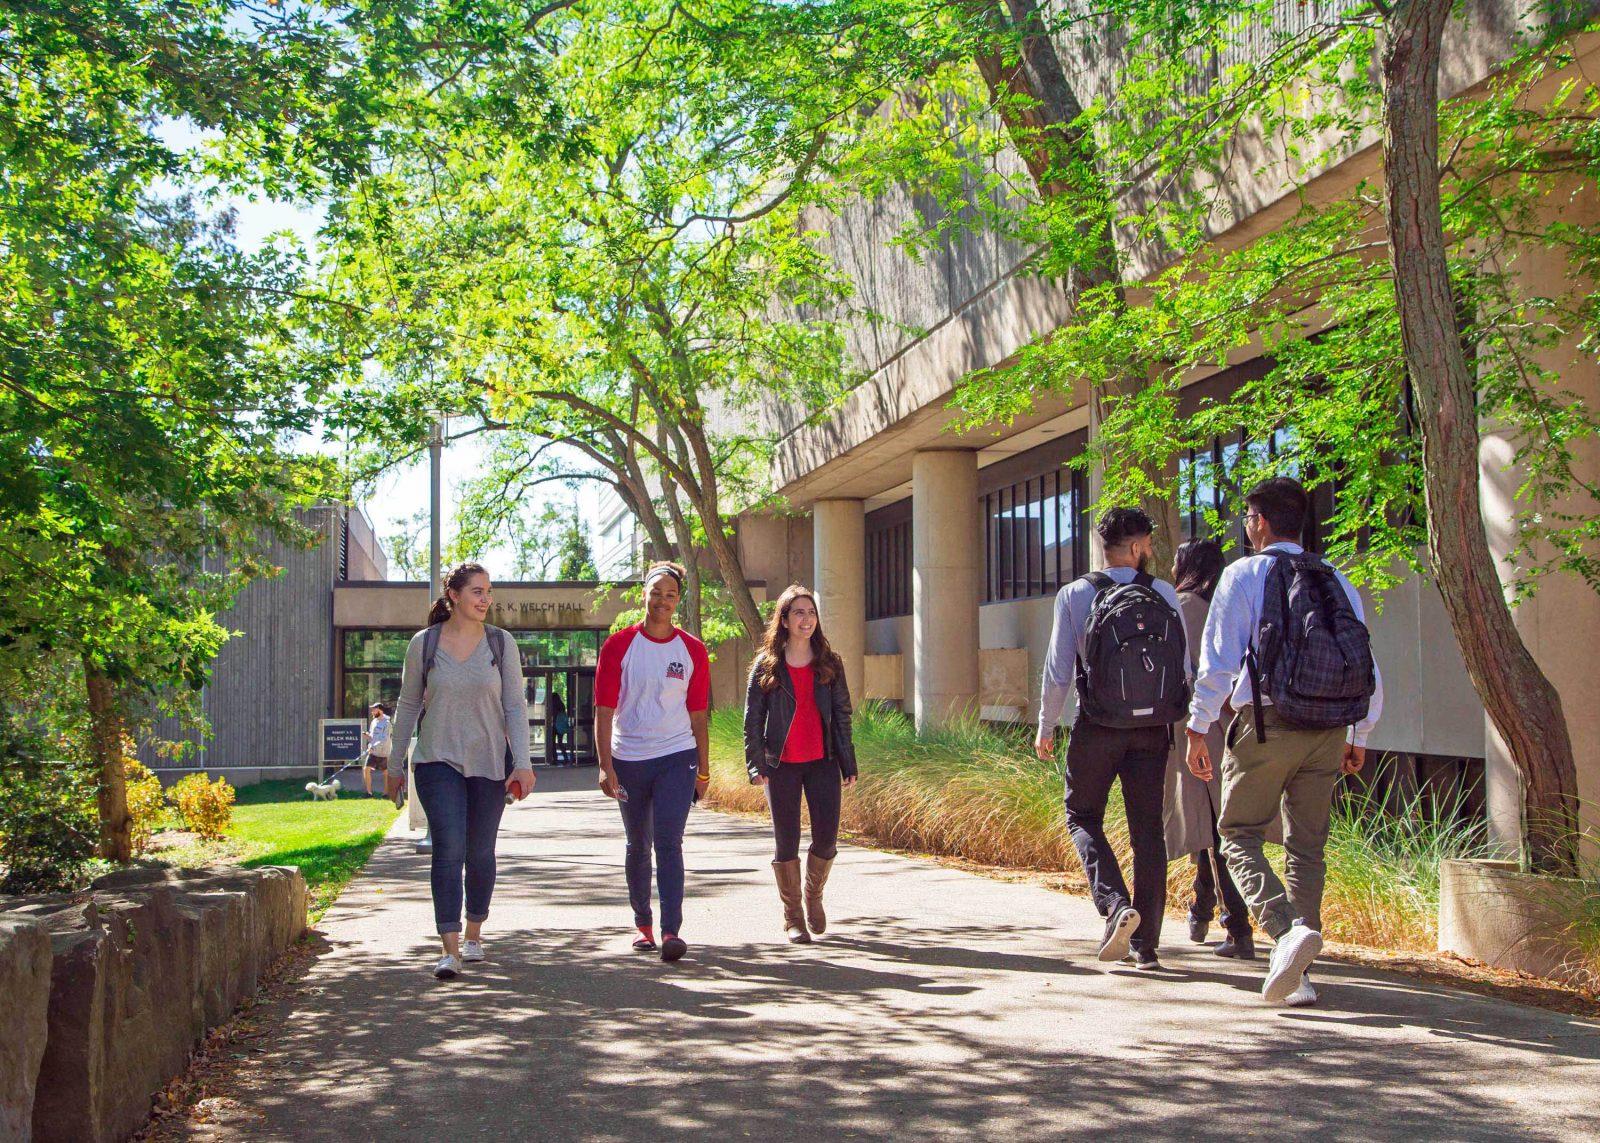 Brock students walking on campus